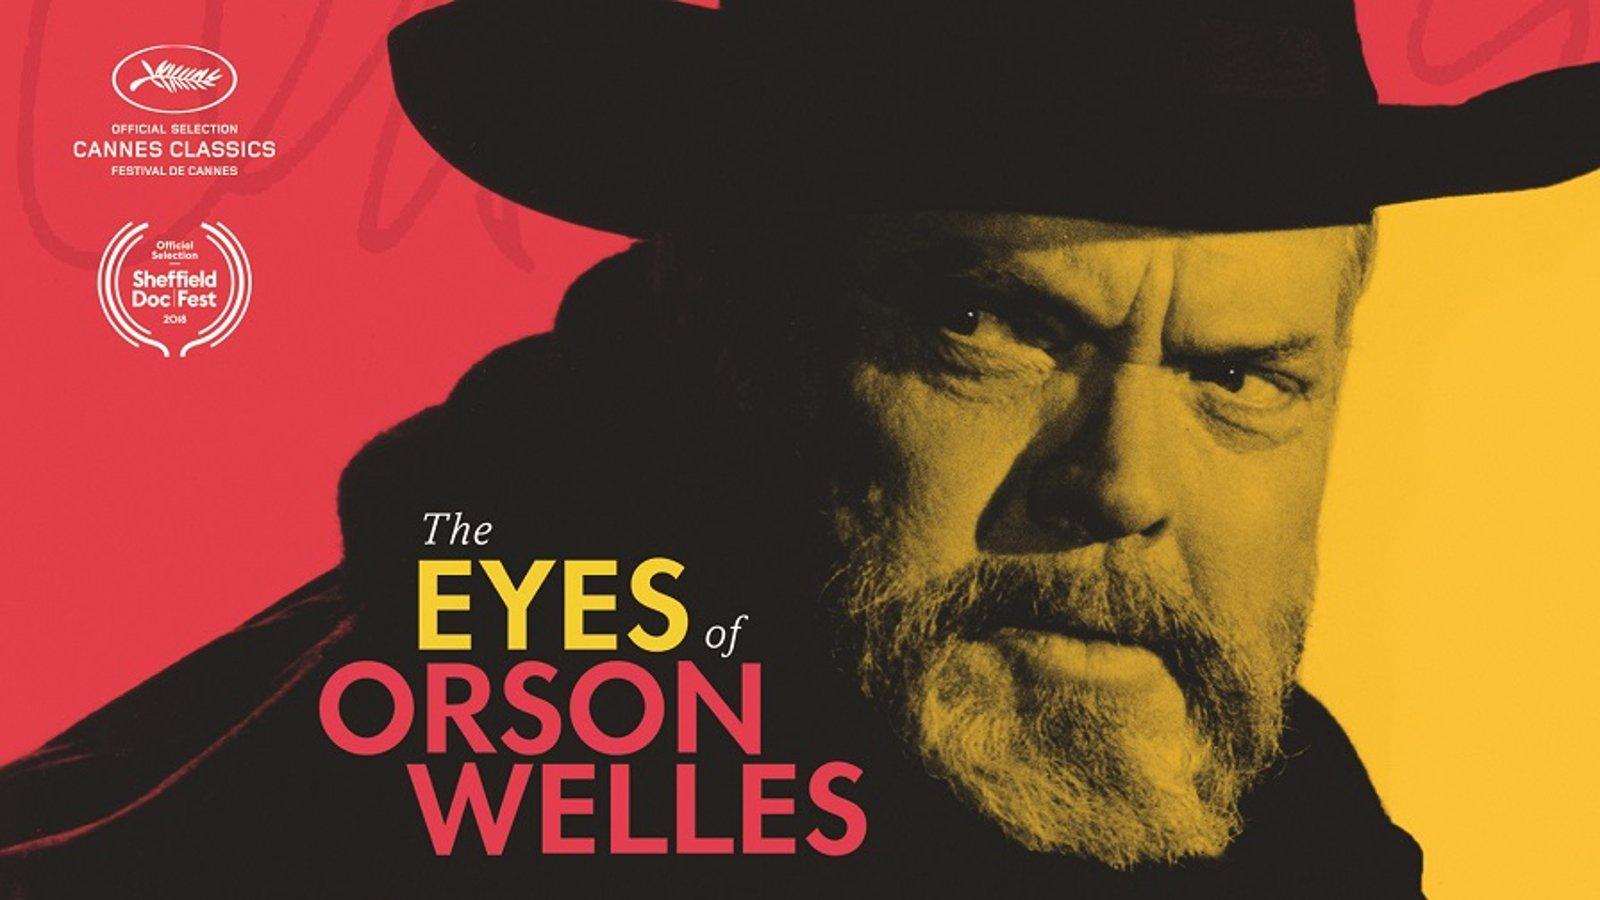 The Eyes Of Orson Welles - The Visual Art of the Legendary Filmmaker